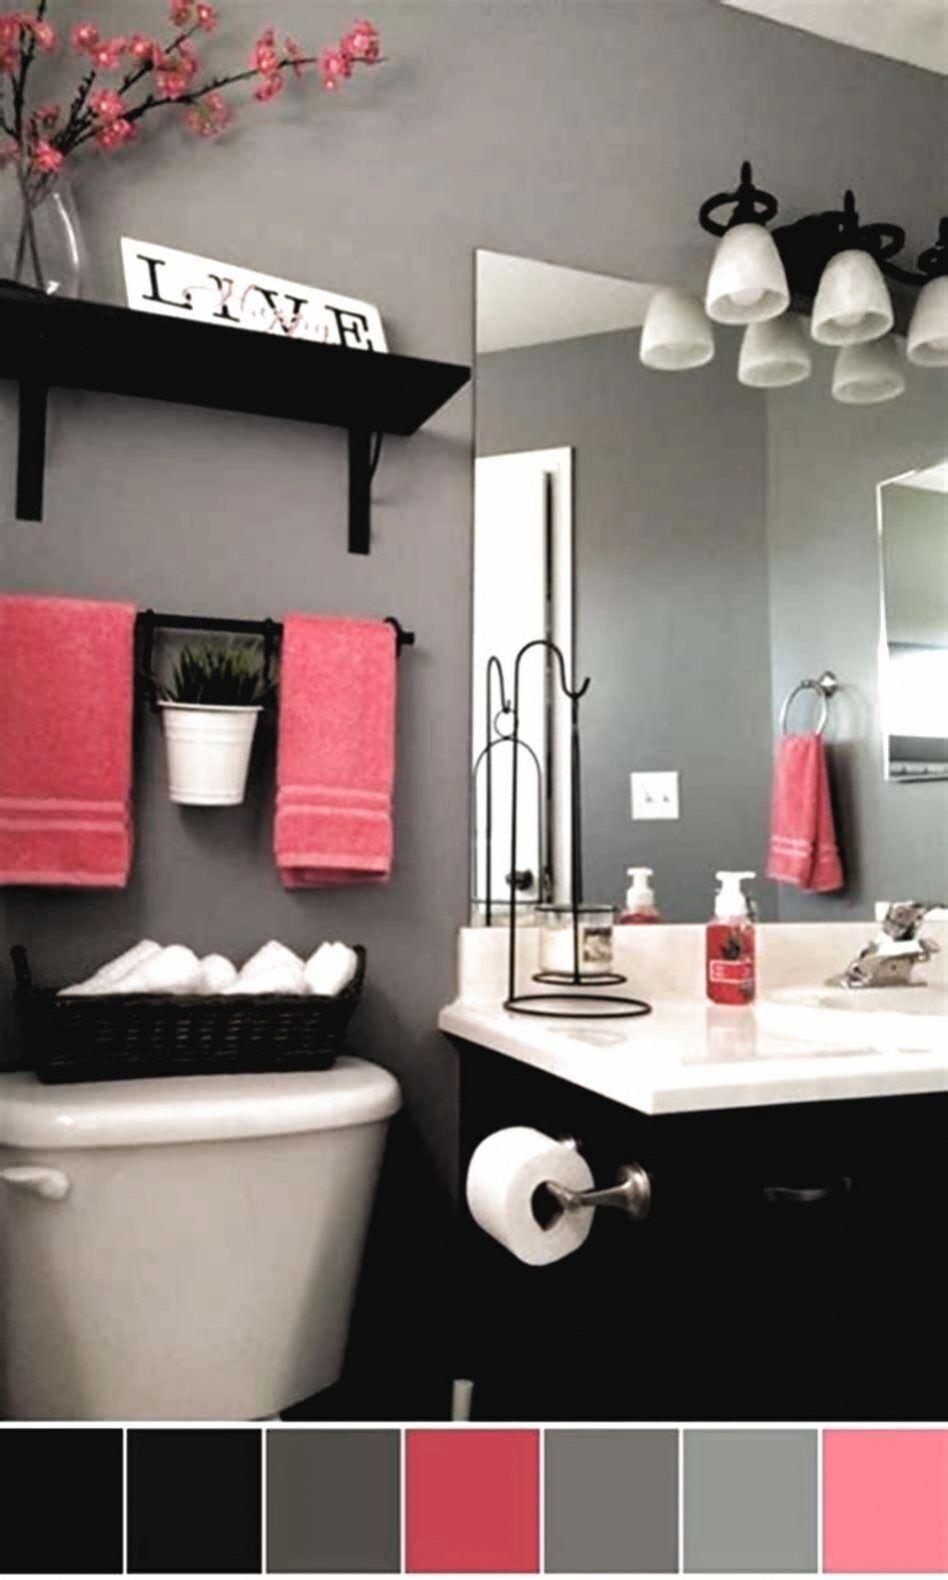 Best Color Schemes Bathroom Decorating Ideas On A Budget 2019 In 2020 Bathroom Color Schemes Bathroom Colors Gray Bathroom Colors